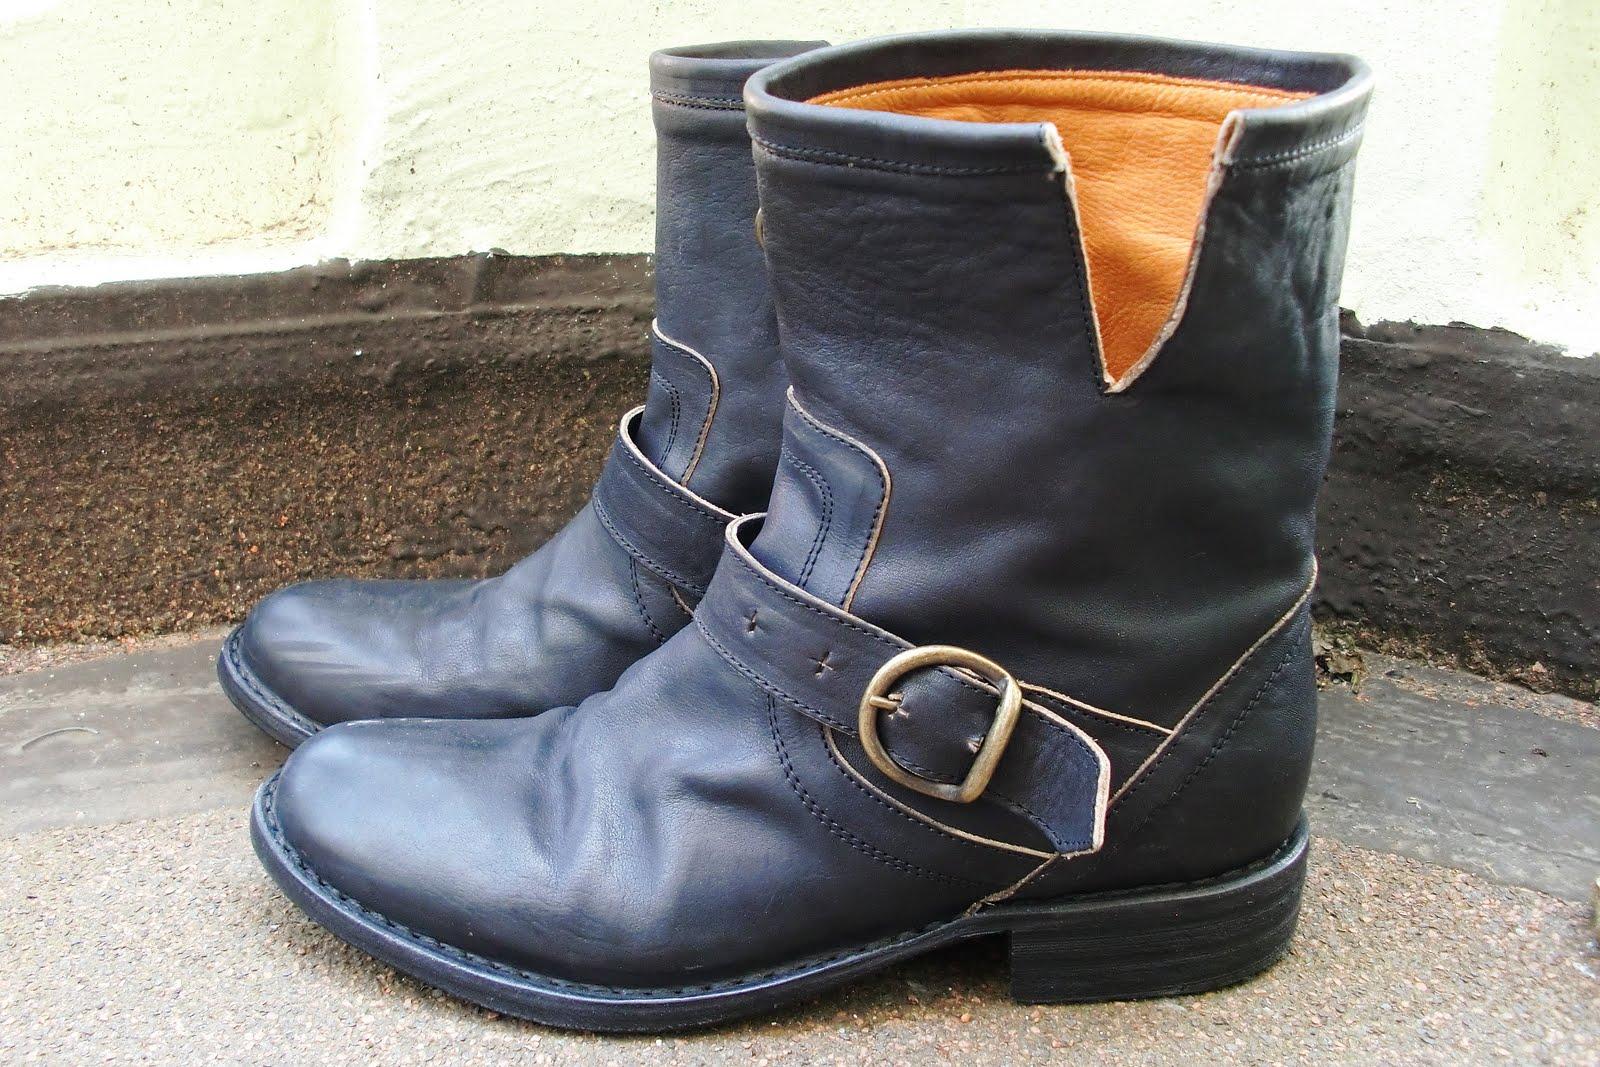 90e3473789d3 fiorentini baker boots DUPE - Fashion - GLAMunity - das GLAMOUR Forum